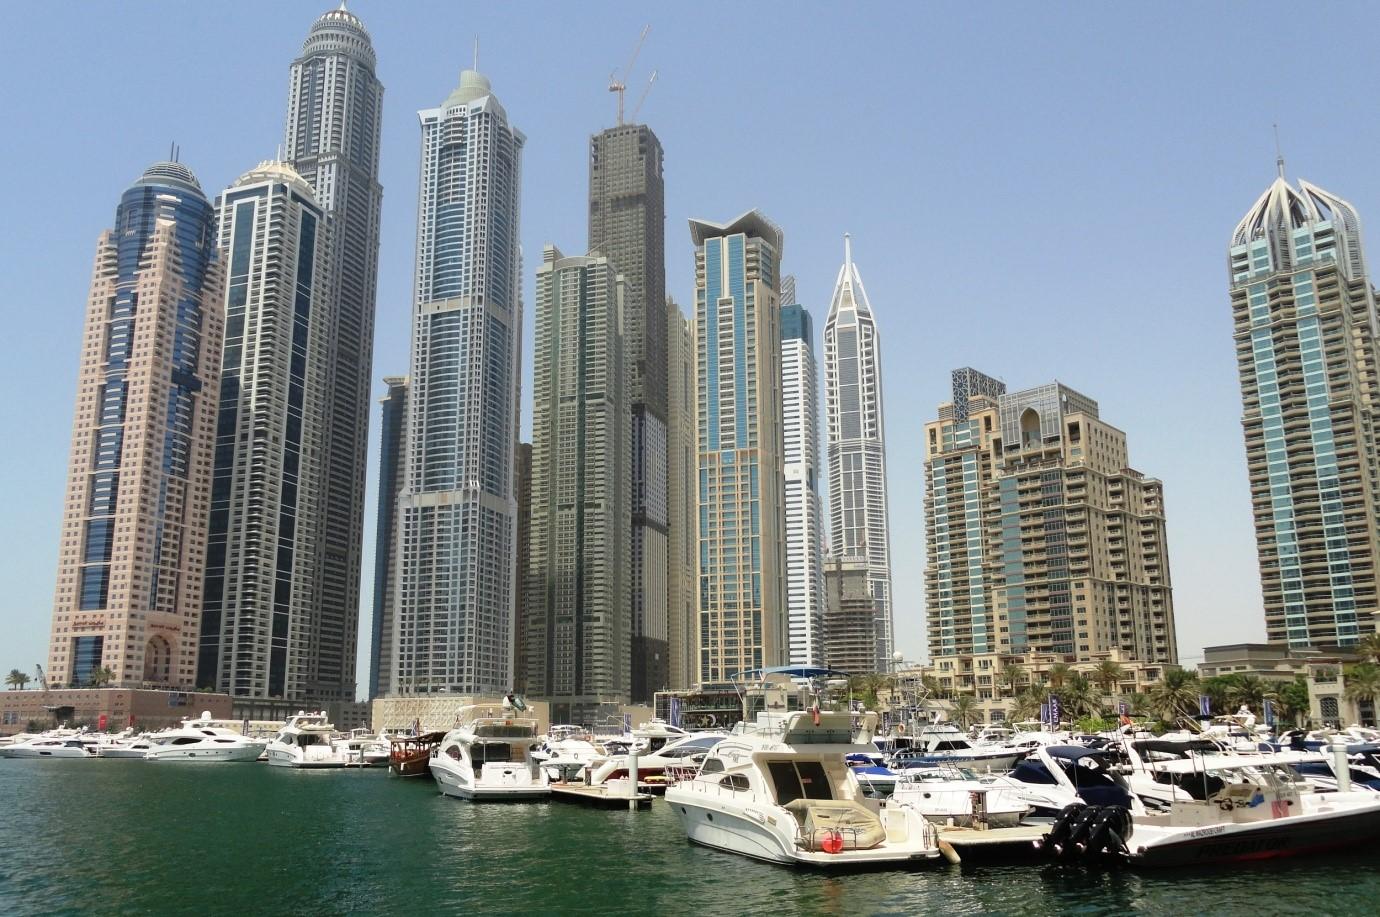 Foto: Dubái | Wikipedia Commons